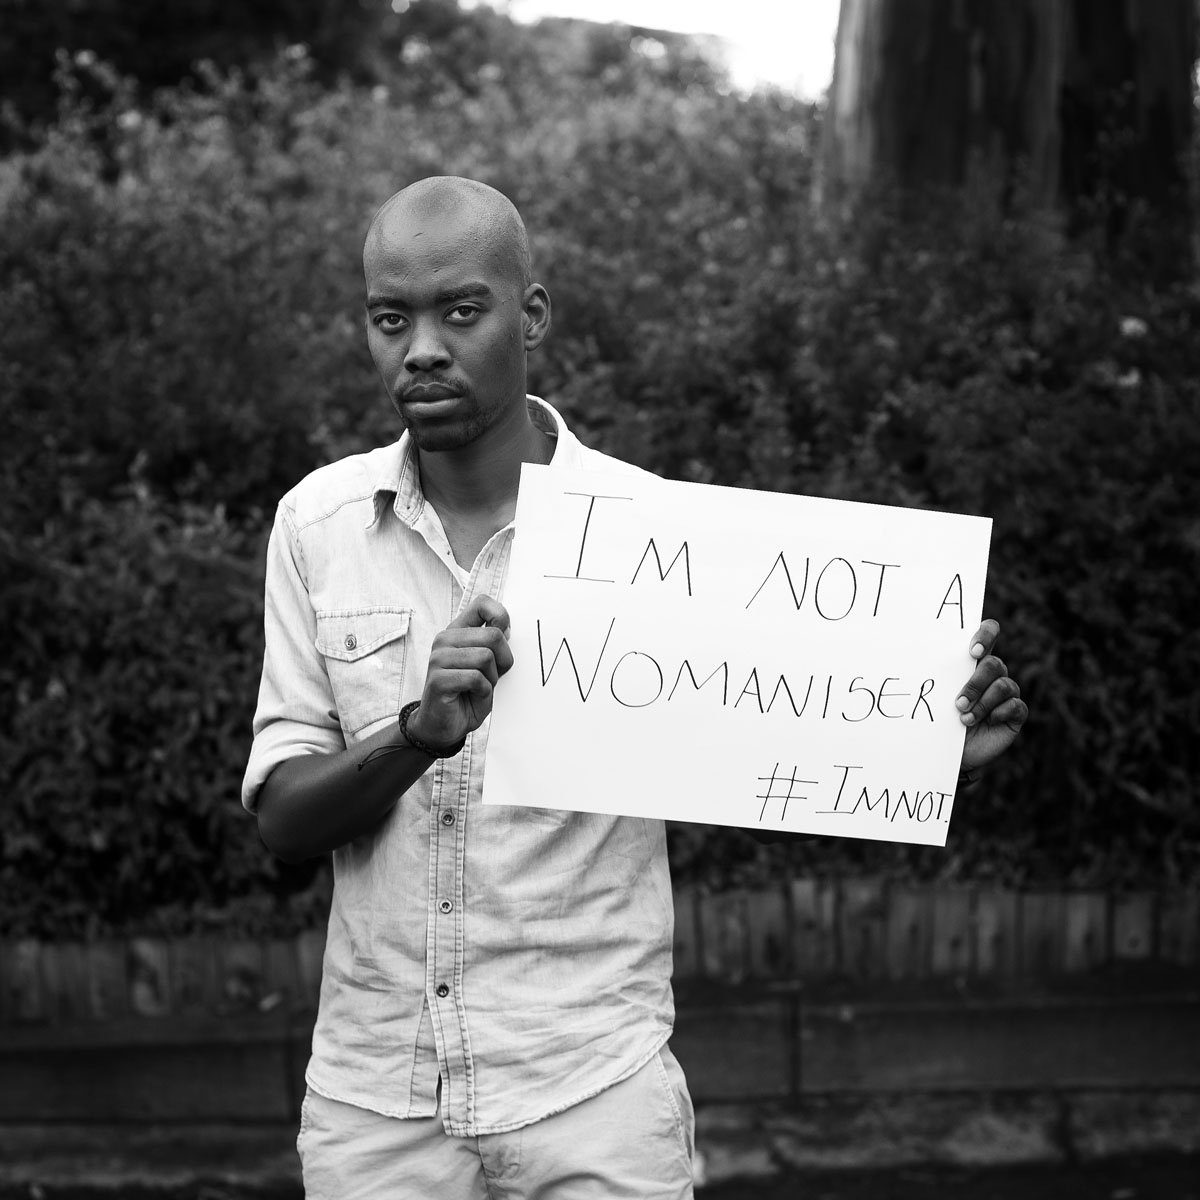 #Imnot a womaniser